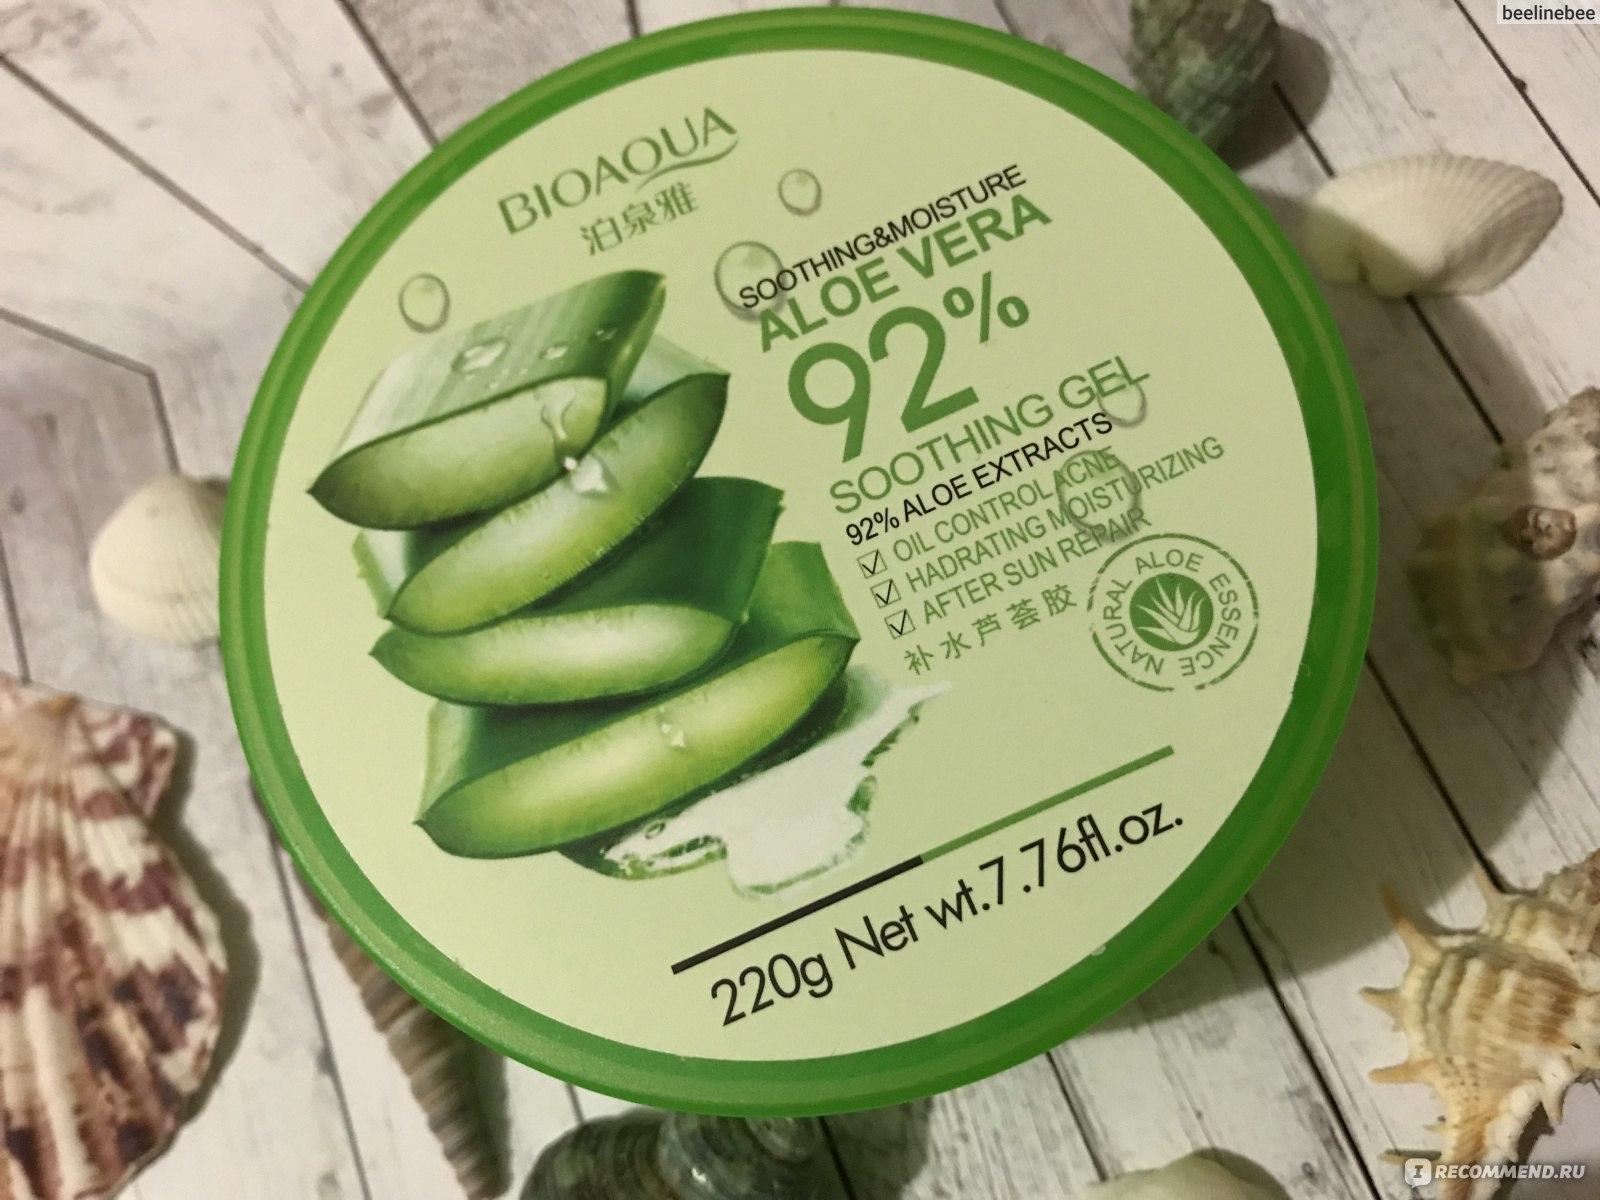 Promo Bioaqua Soothing And Moisture Aloe Vera Gel 92 Terbaru 2018 Mountea Teh 180ml Karton Extracts Soothingmoisture